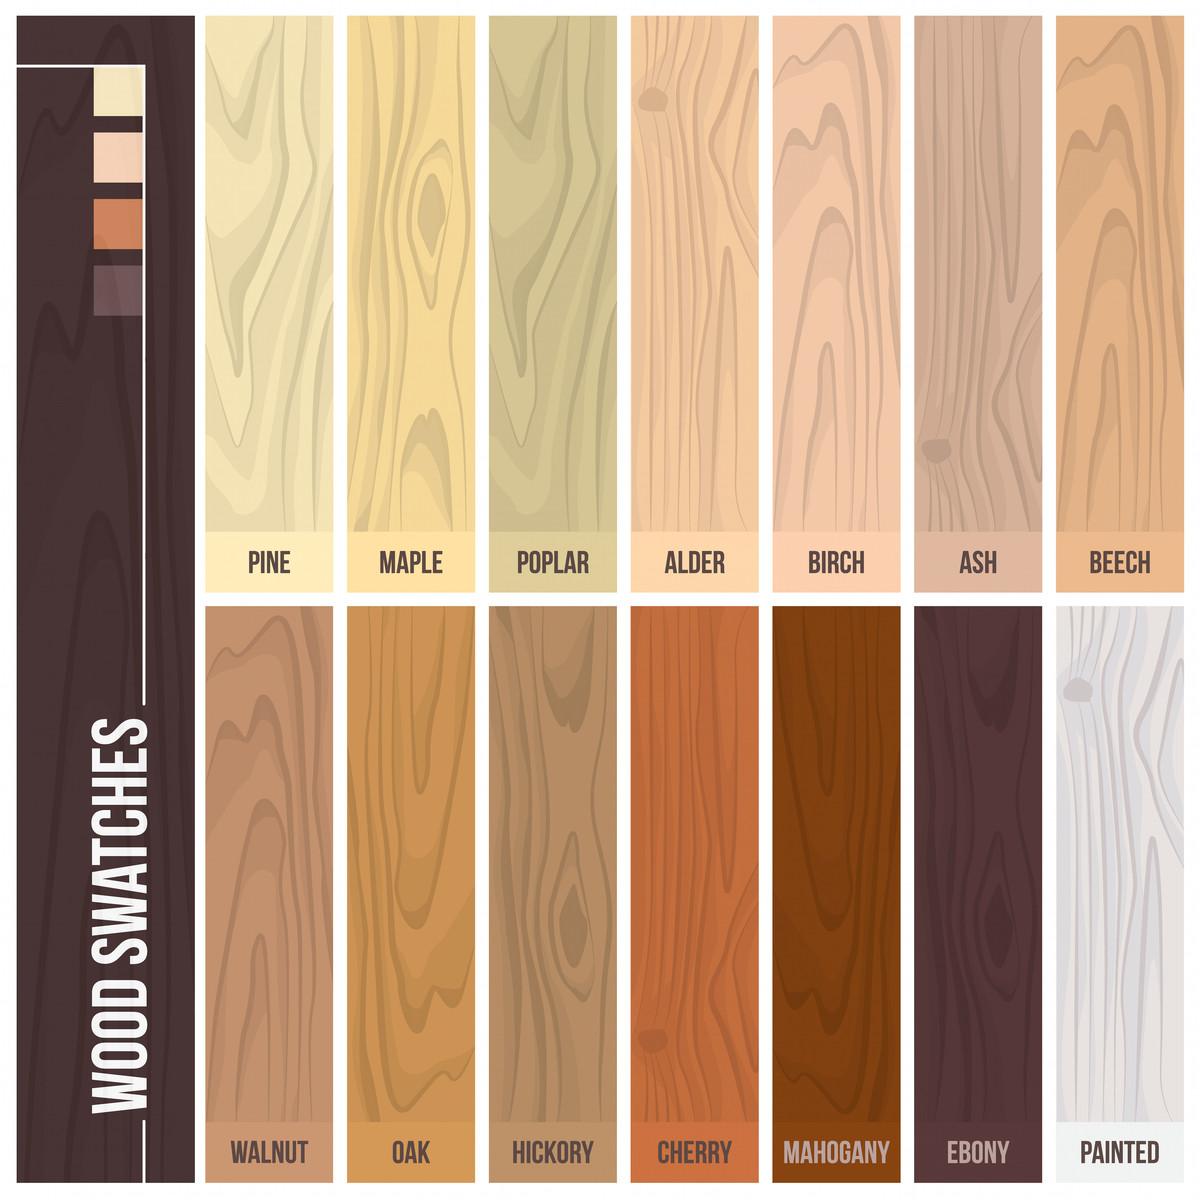 walnut hardwood flooring cost of 12 types of hardwood flooring species styles edging dimensions with types of hardwood flooring illustrated guide